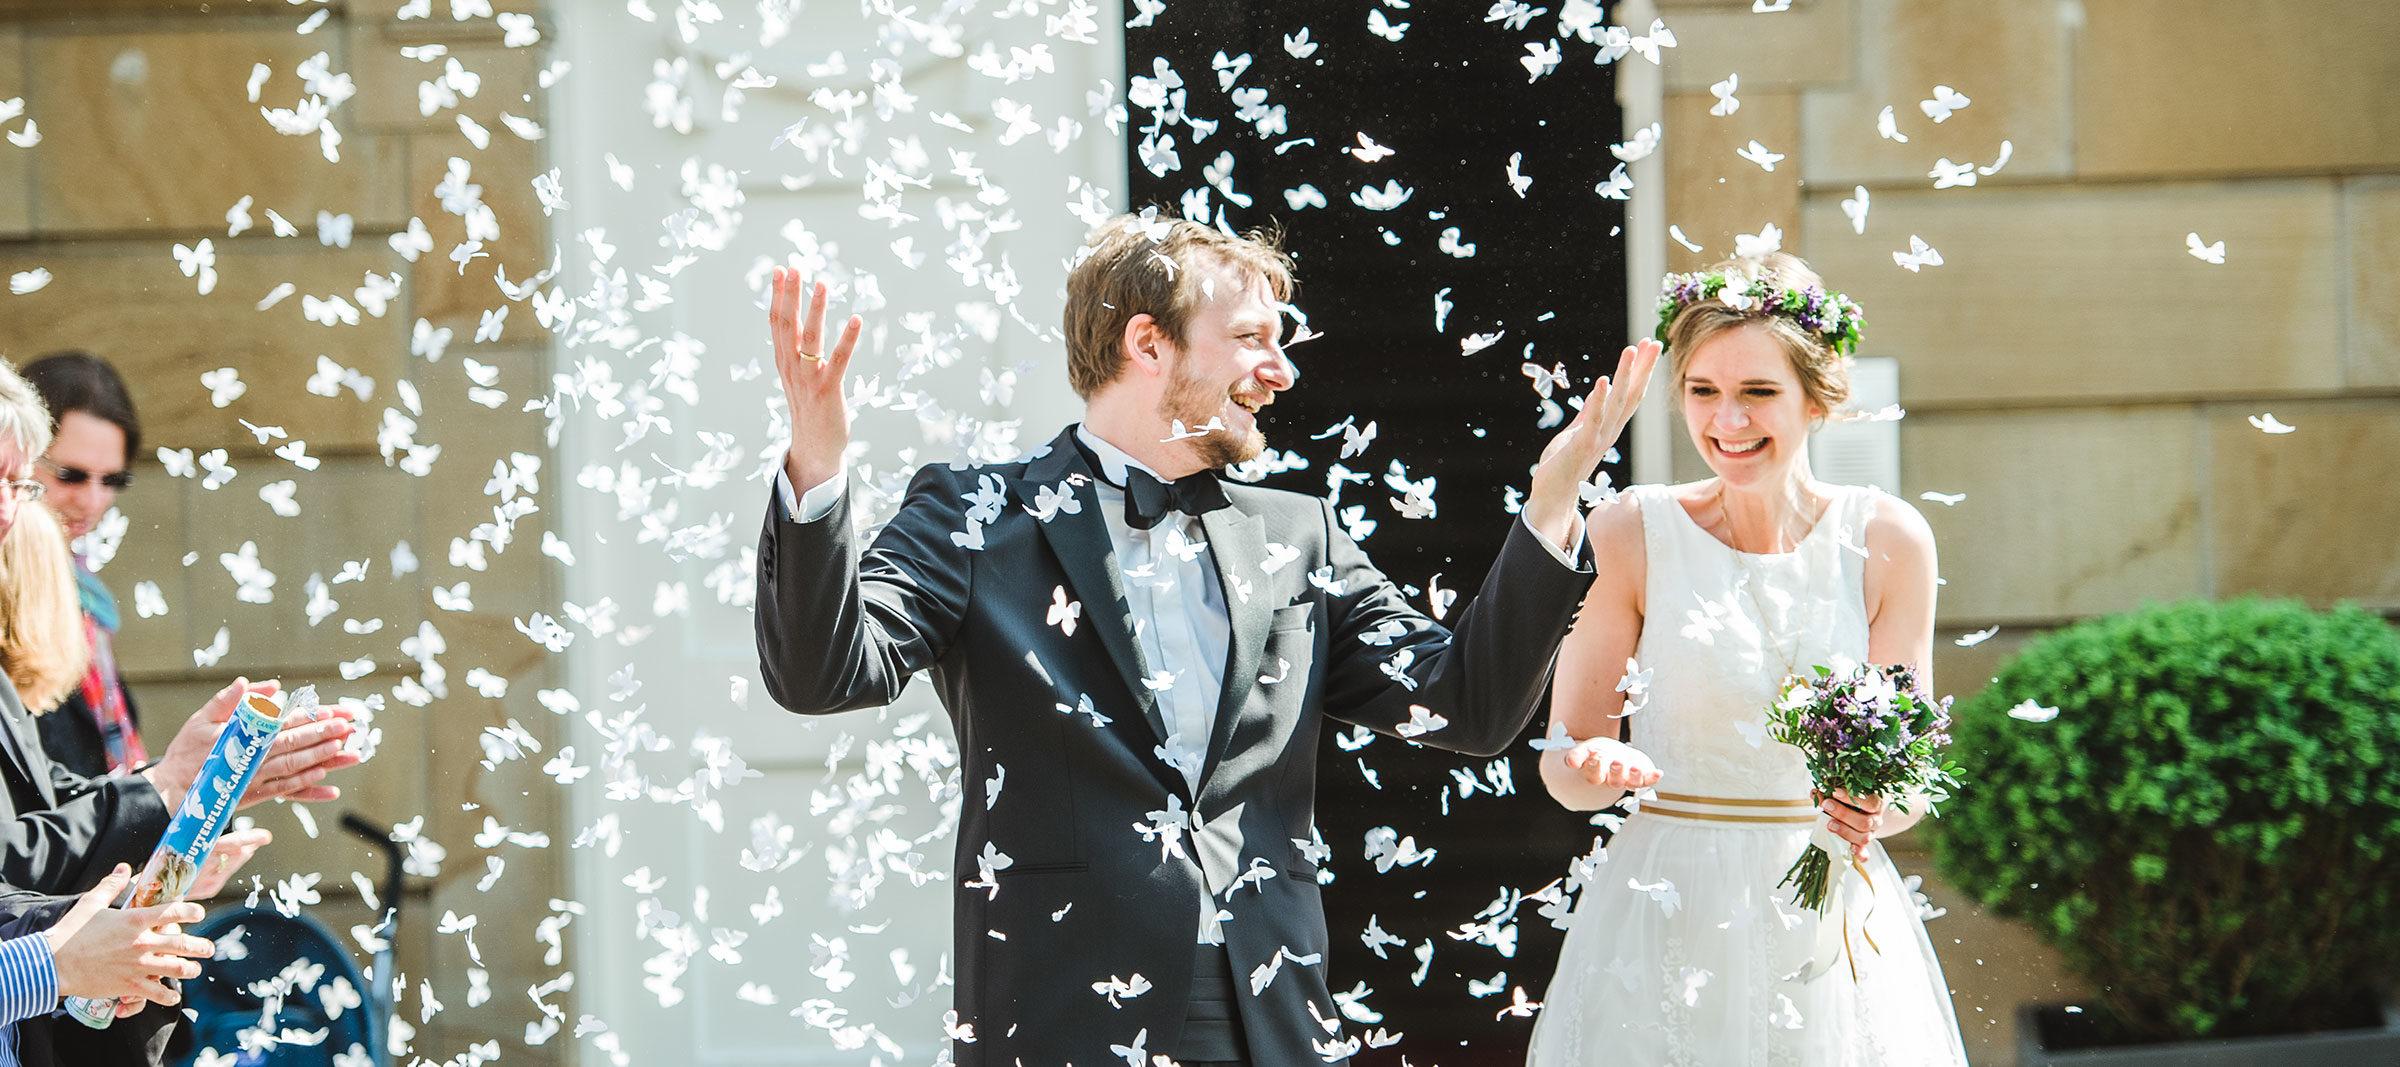 Hochzeitsfotograf Mainz Georgij Shugol